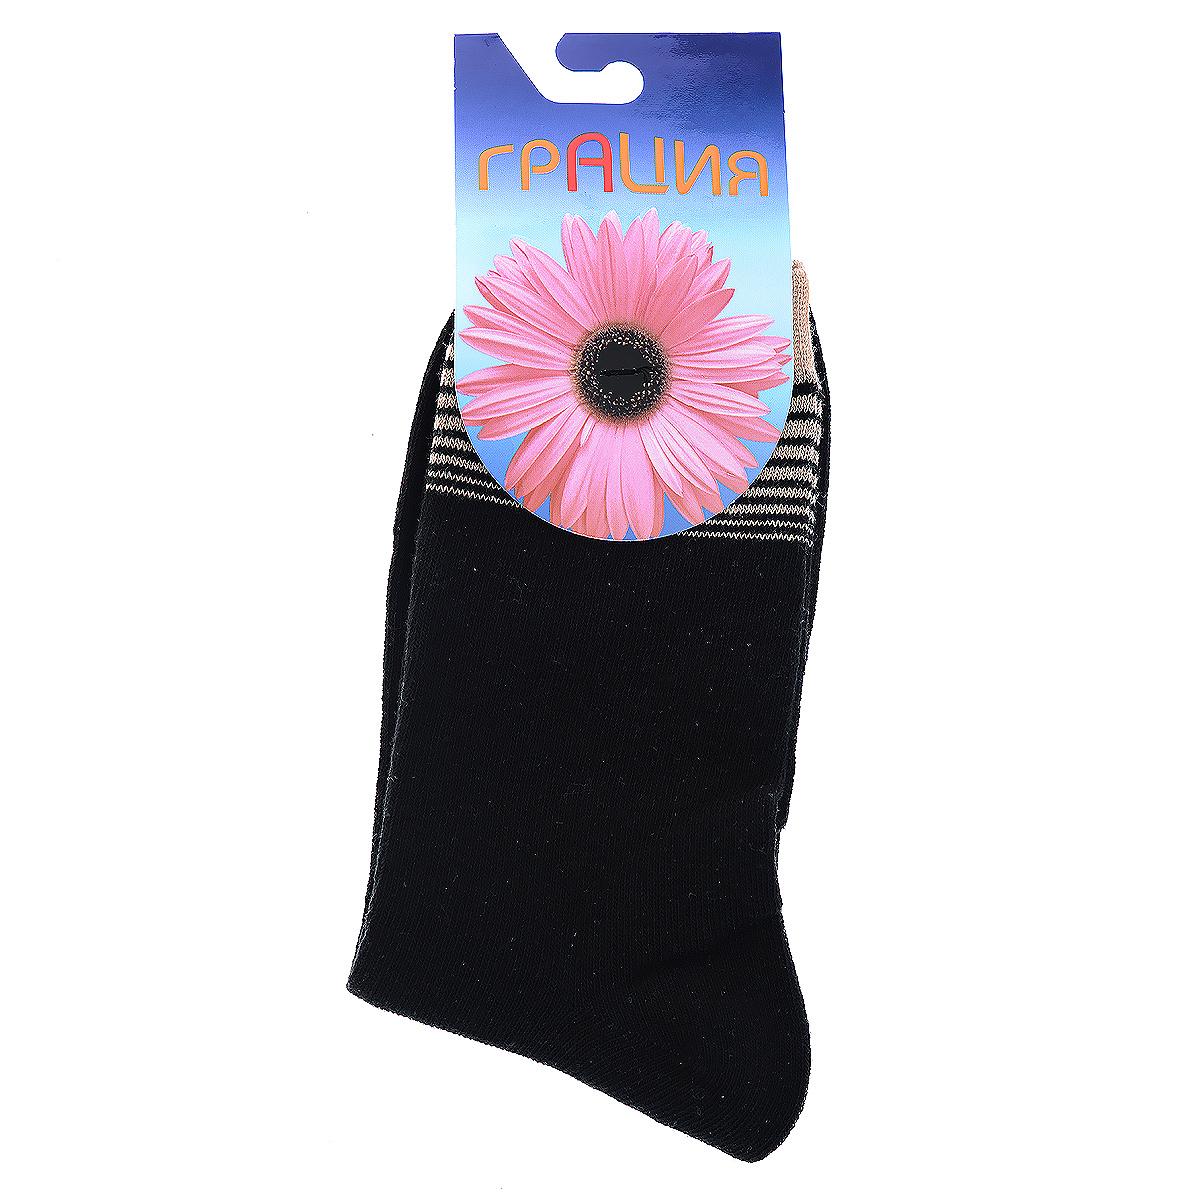 Носки женские Грация, цвет: черный, бежевый. Н 002-16-19. Размер 38/40 носки женские грация цвет светло серый h 003 размер 38 40